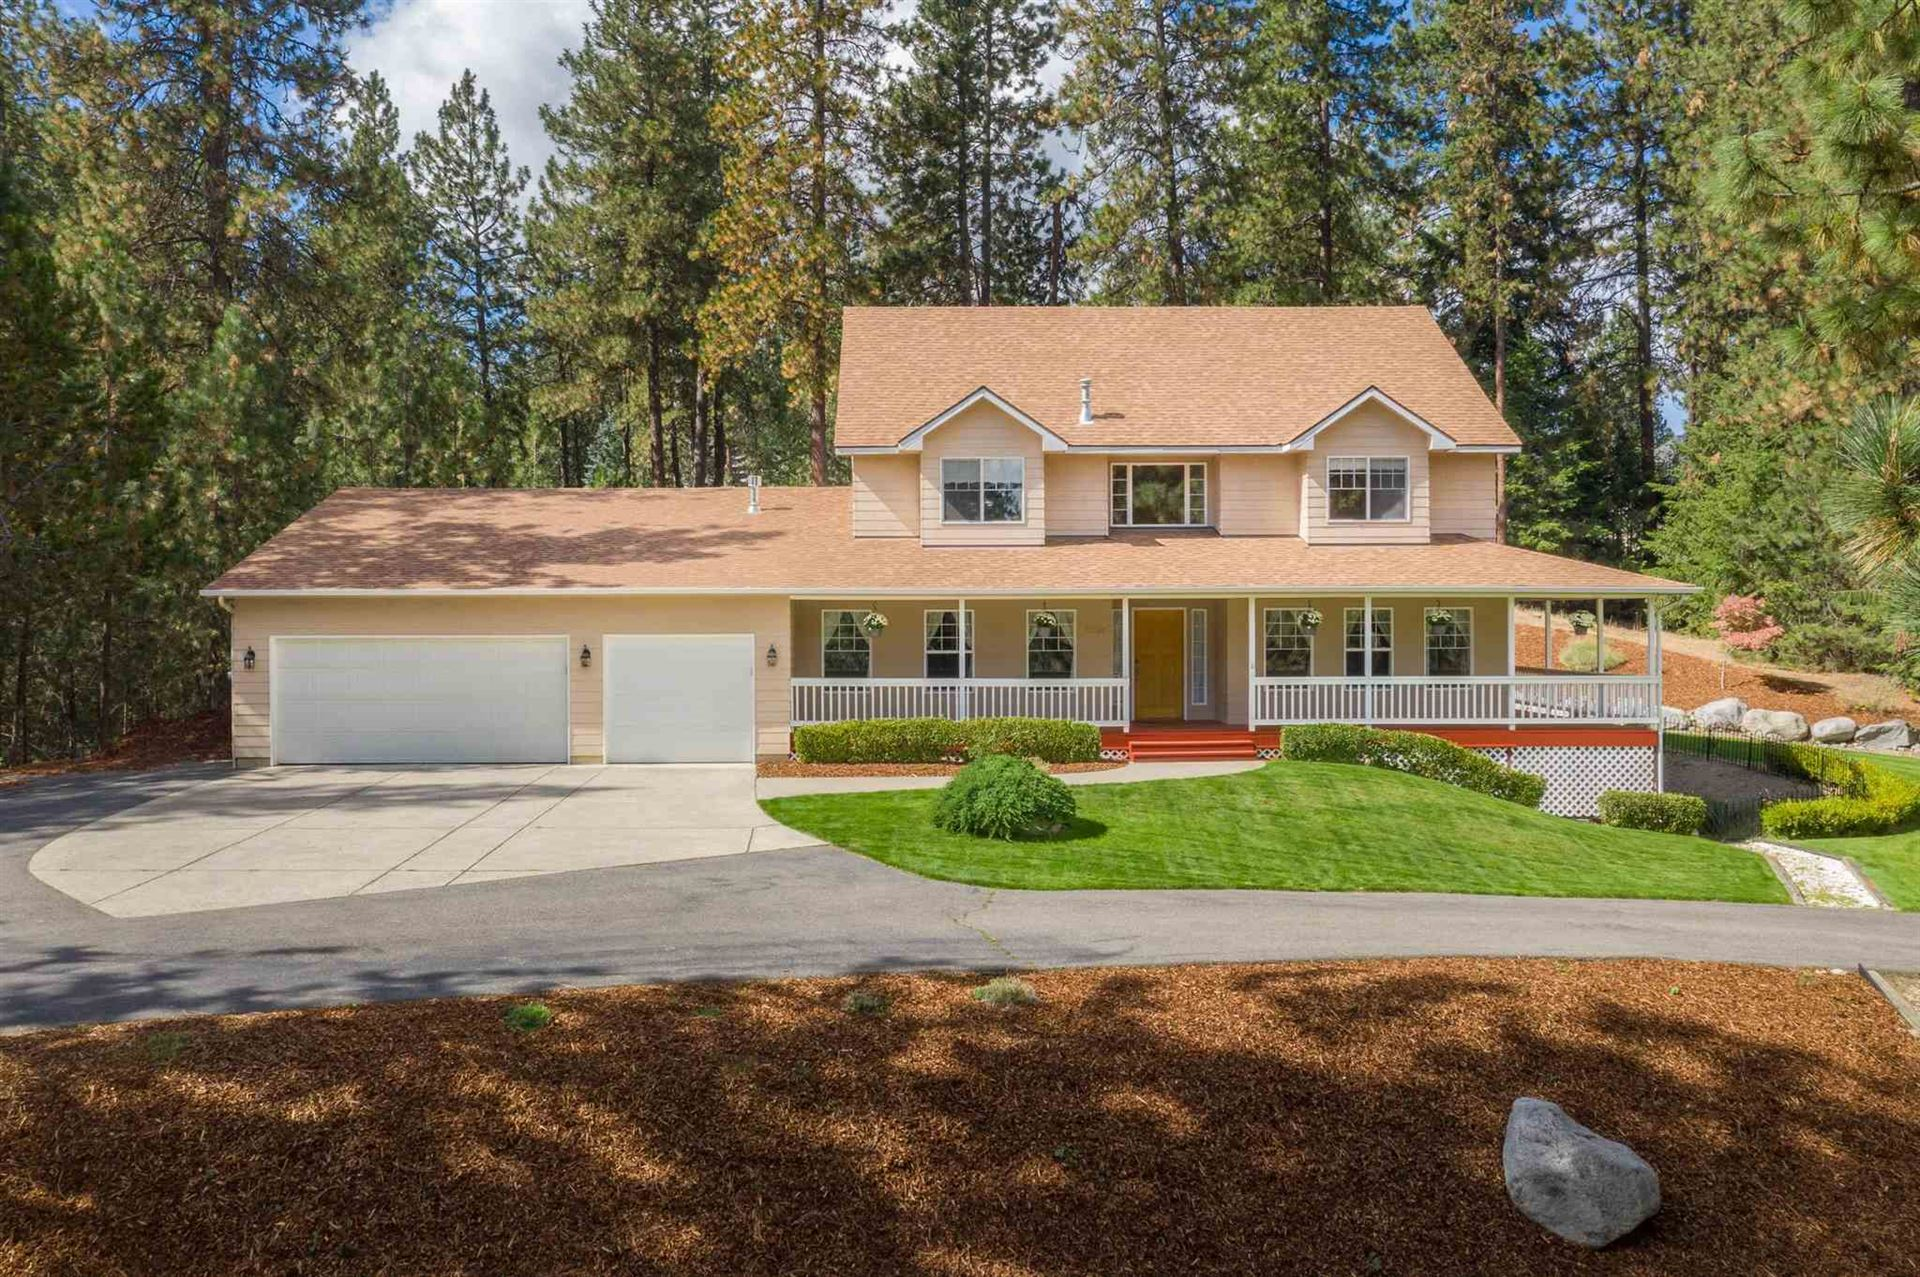 9025 N Oakland Rd, Newman Lake, WA 99025 - #: 202122626